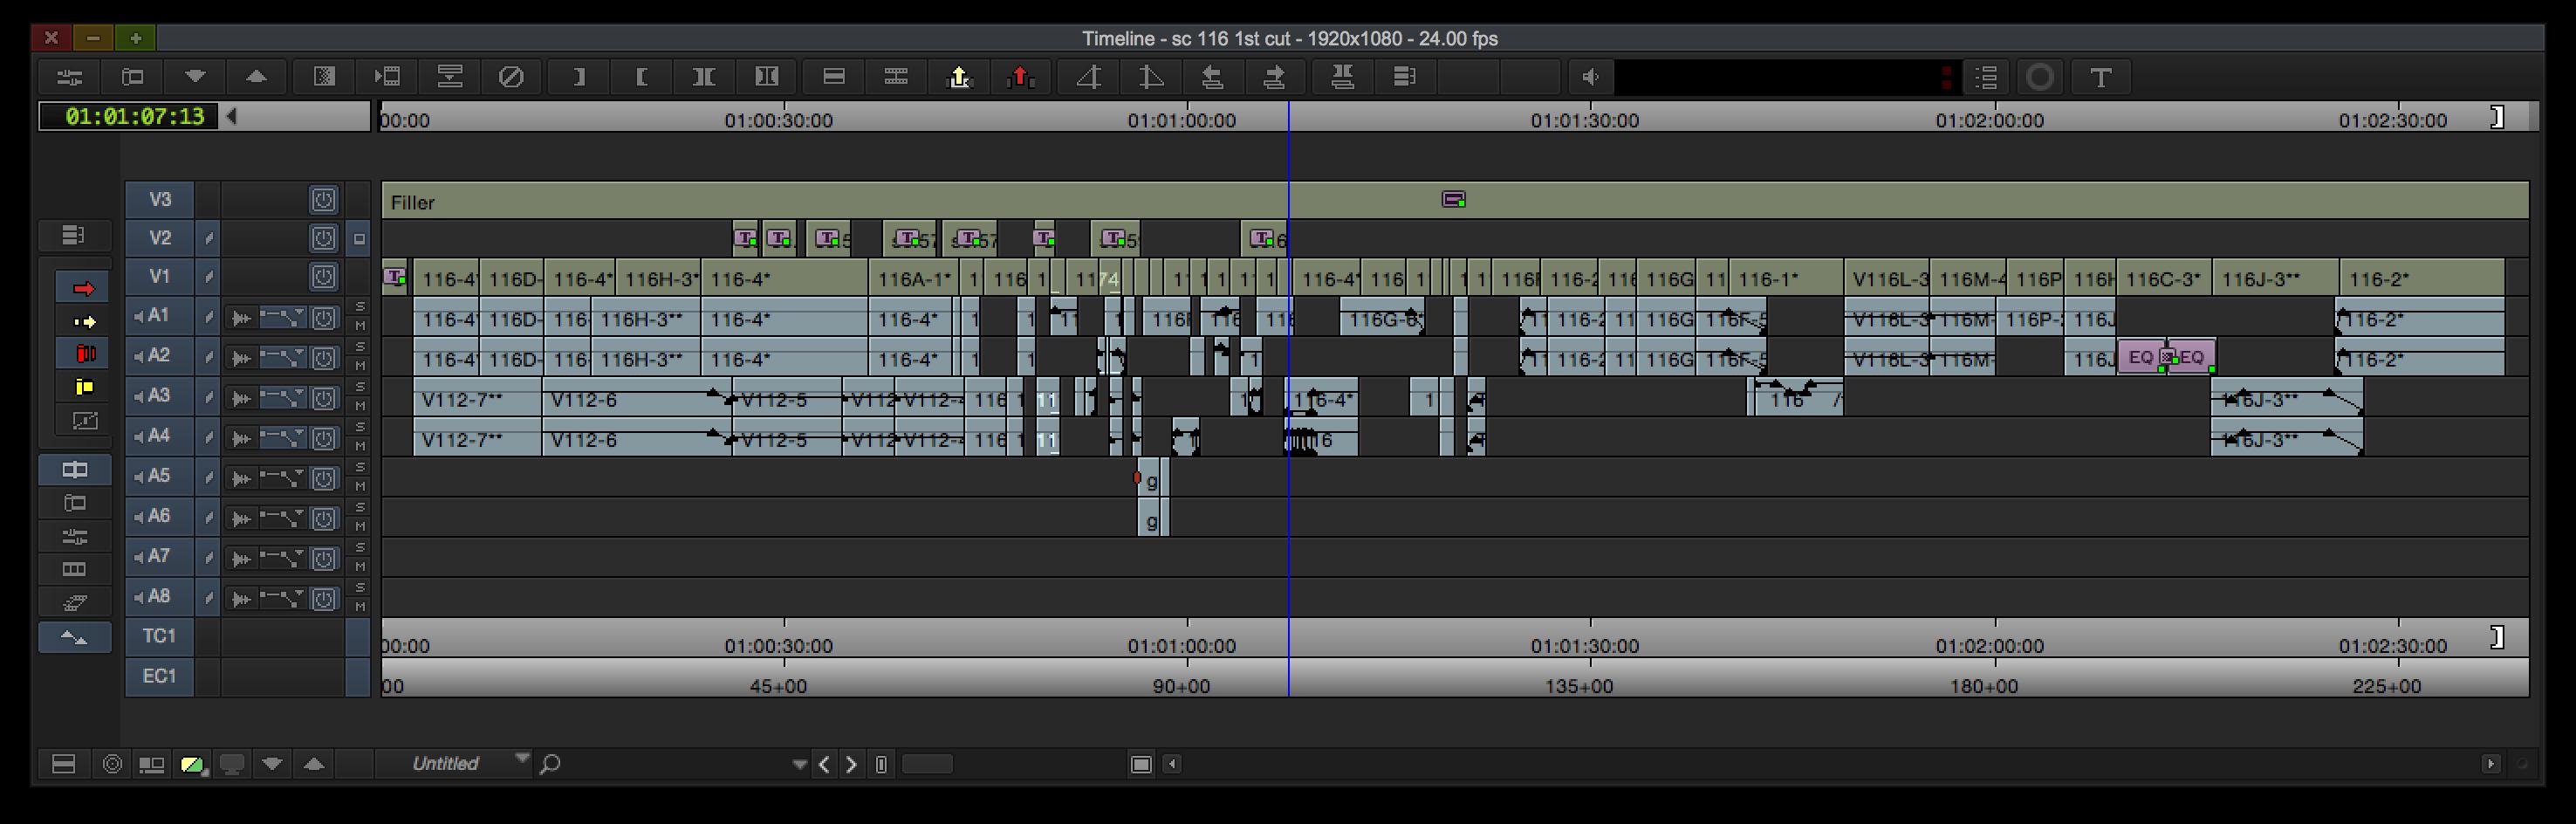 Timeline of the intercut scene